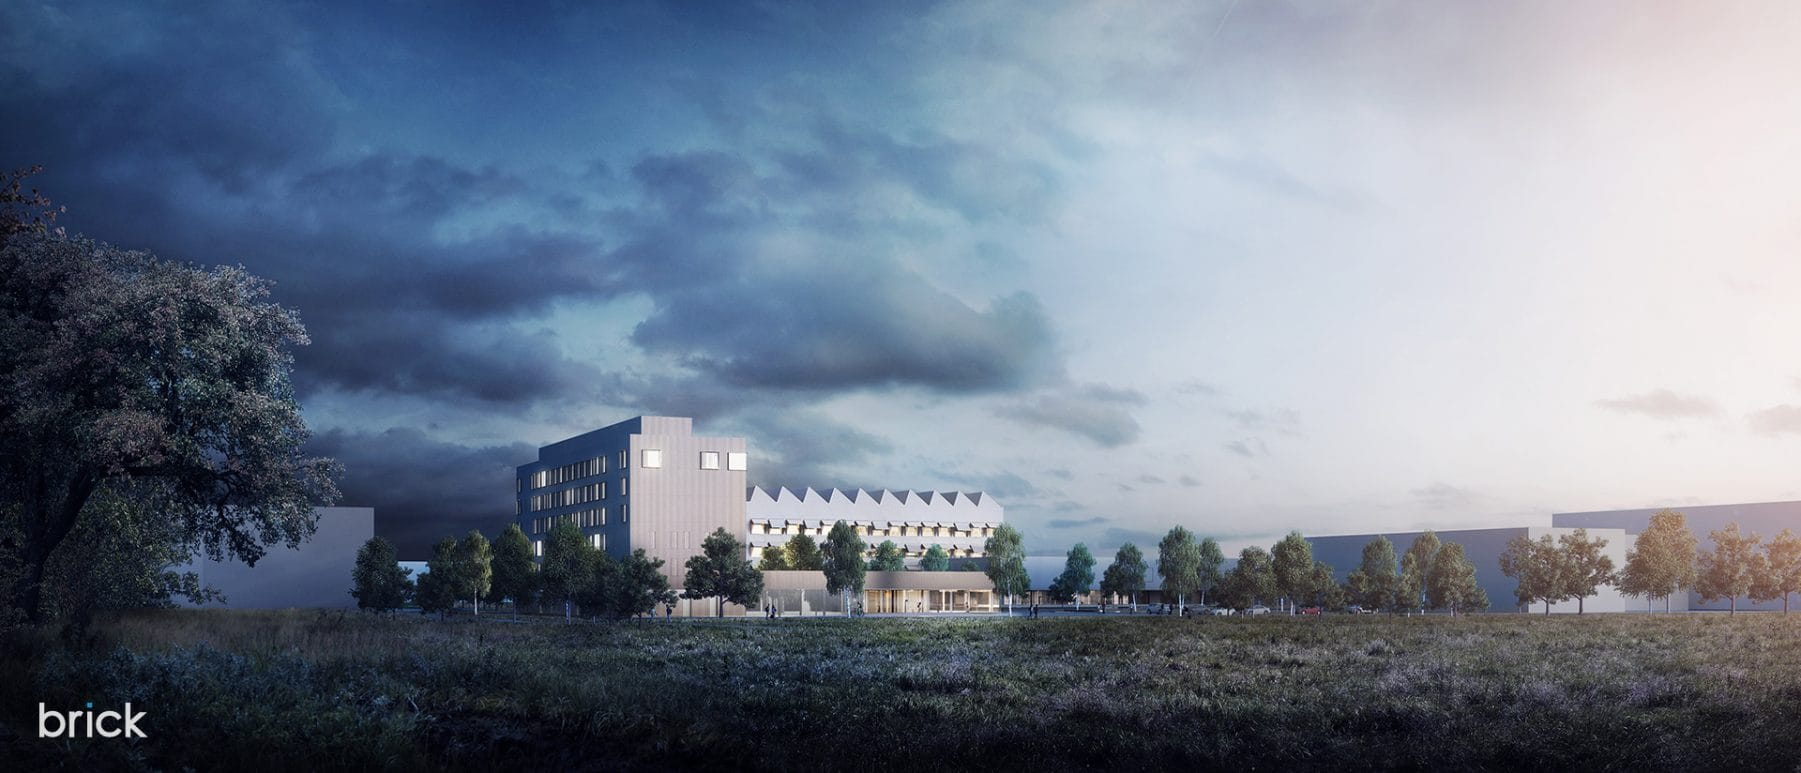 ikea_hotel_architectural_visualization